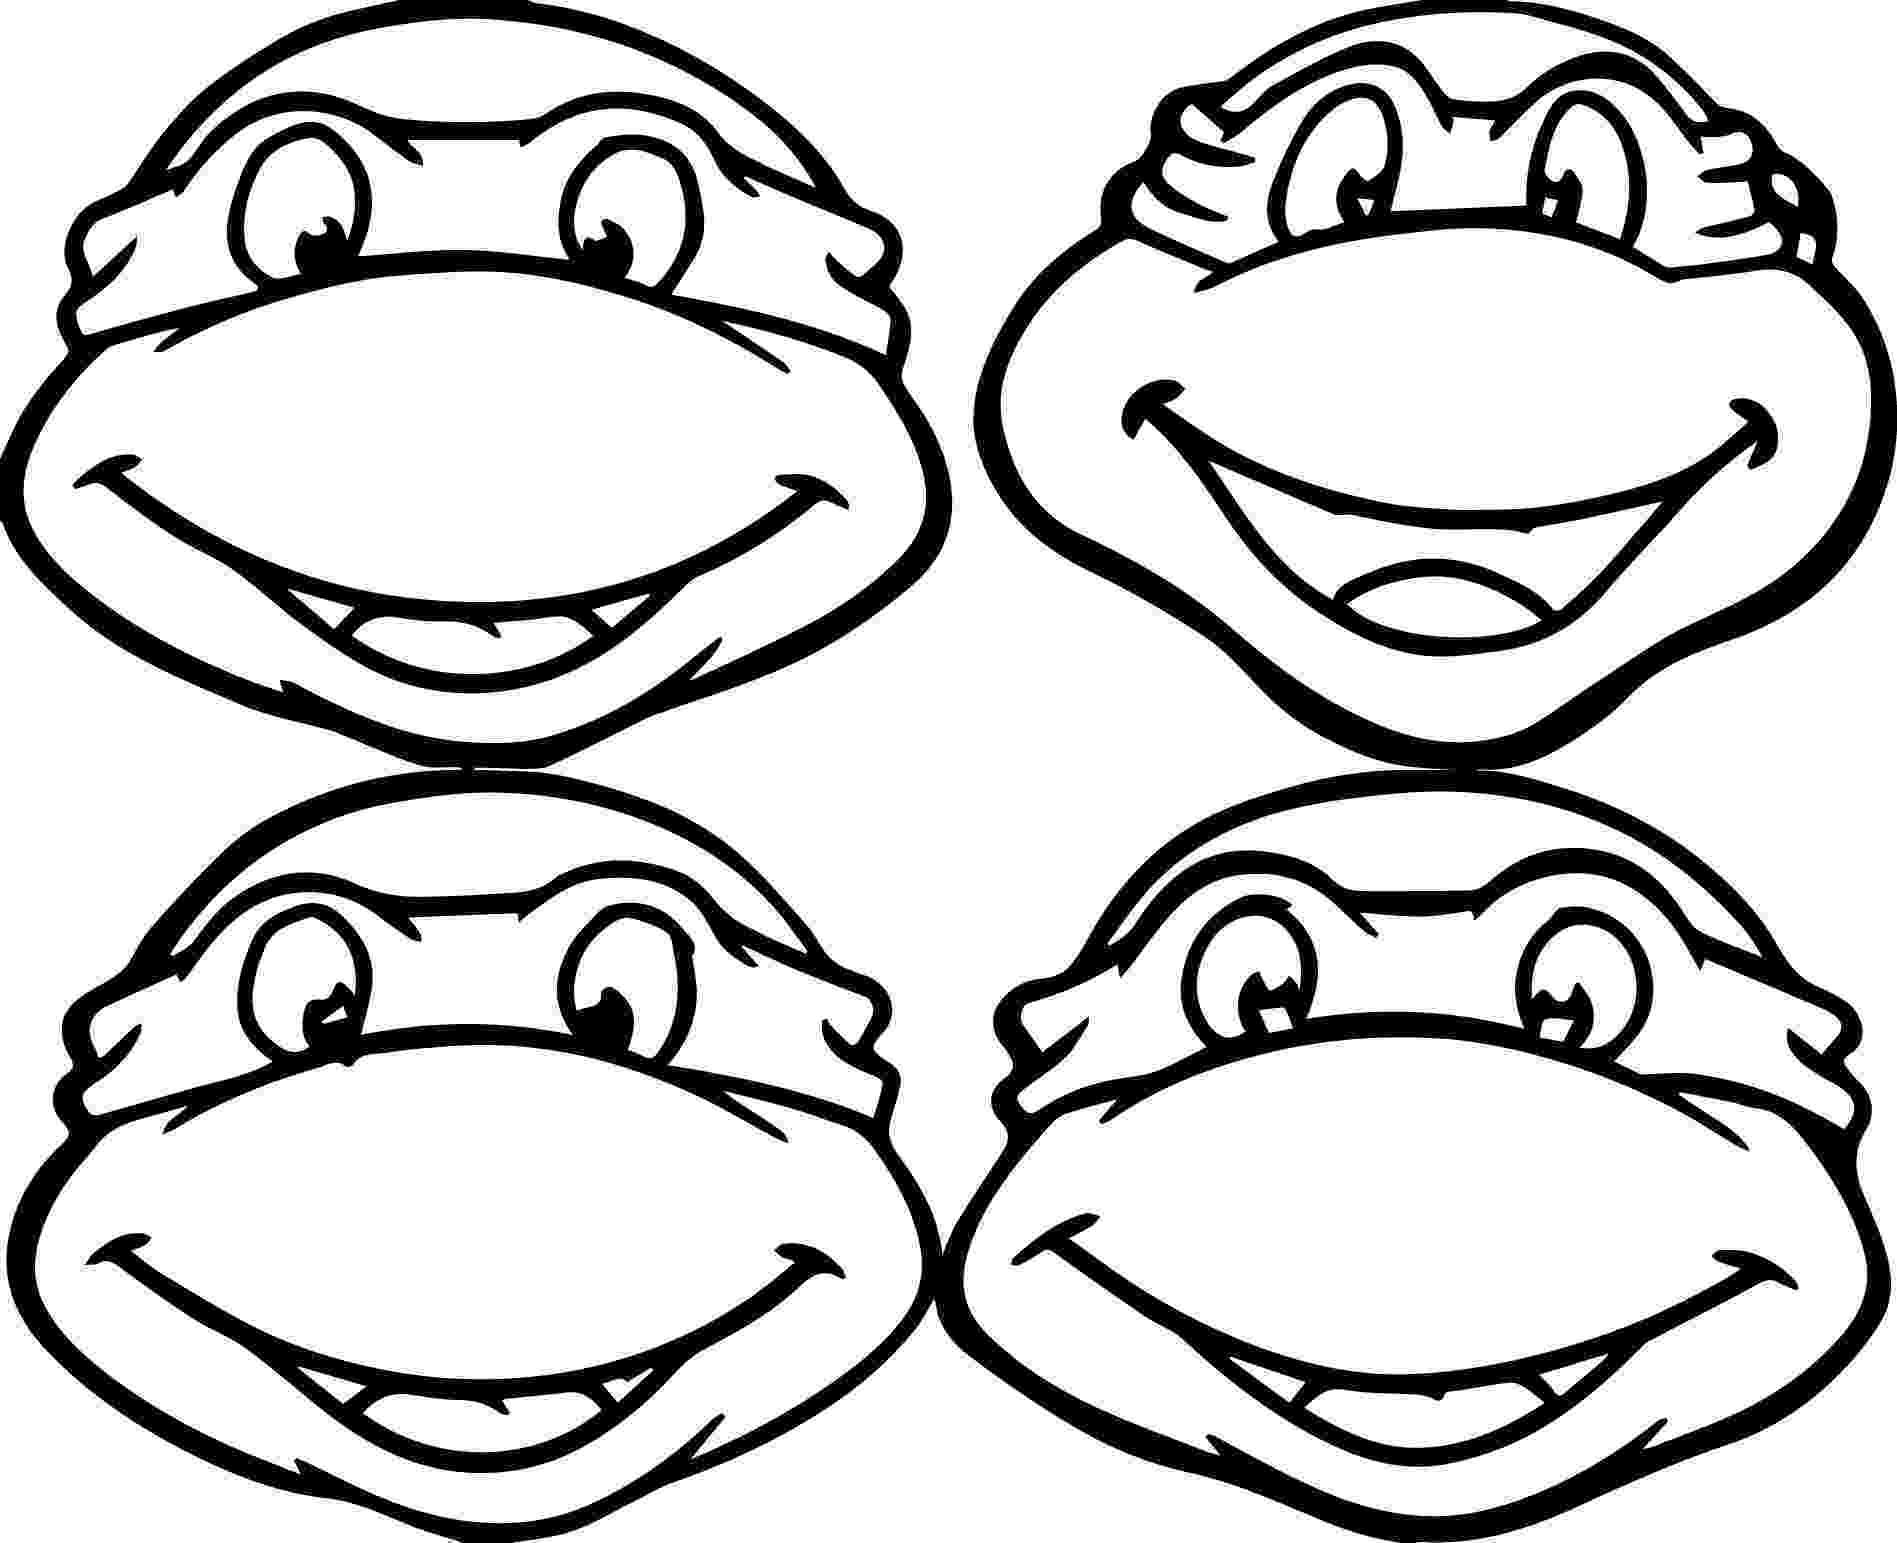 coloring pages turtles ninja ninja turtles art coloring page turtle coloring pages ninja coloring pages turtles